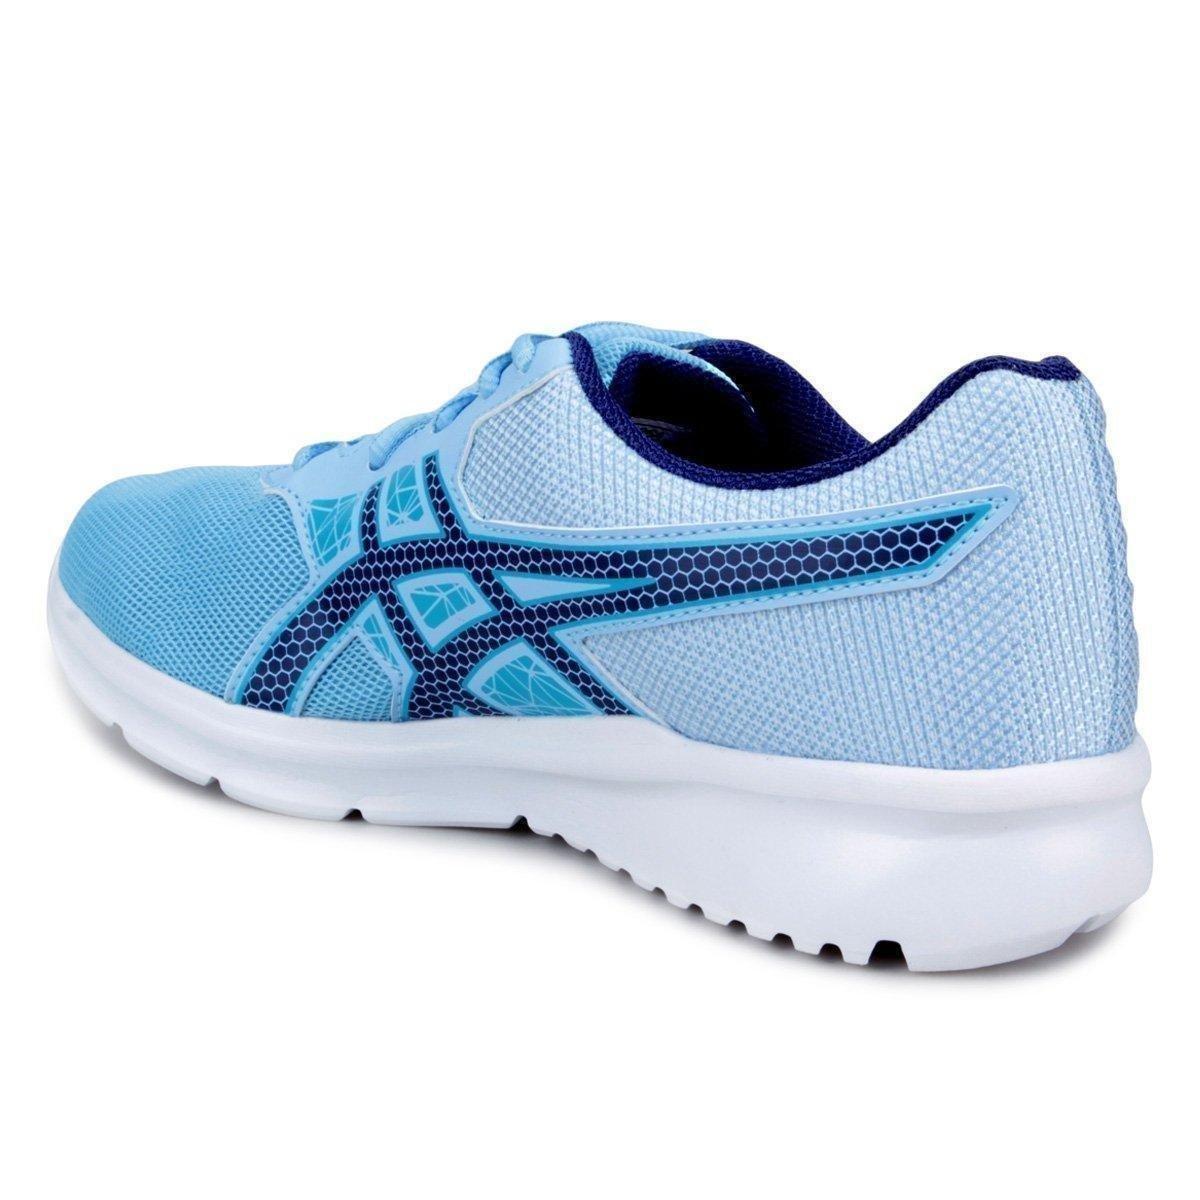 Tênis Asics Tarash Feminino - Azul Claro - Compre Agora  ddb145a9dd56a